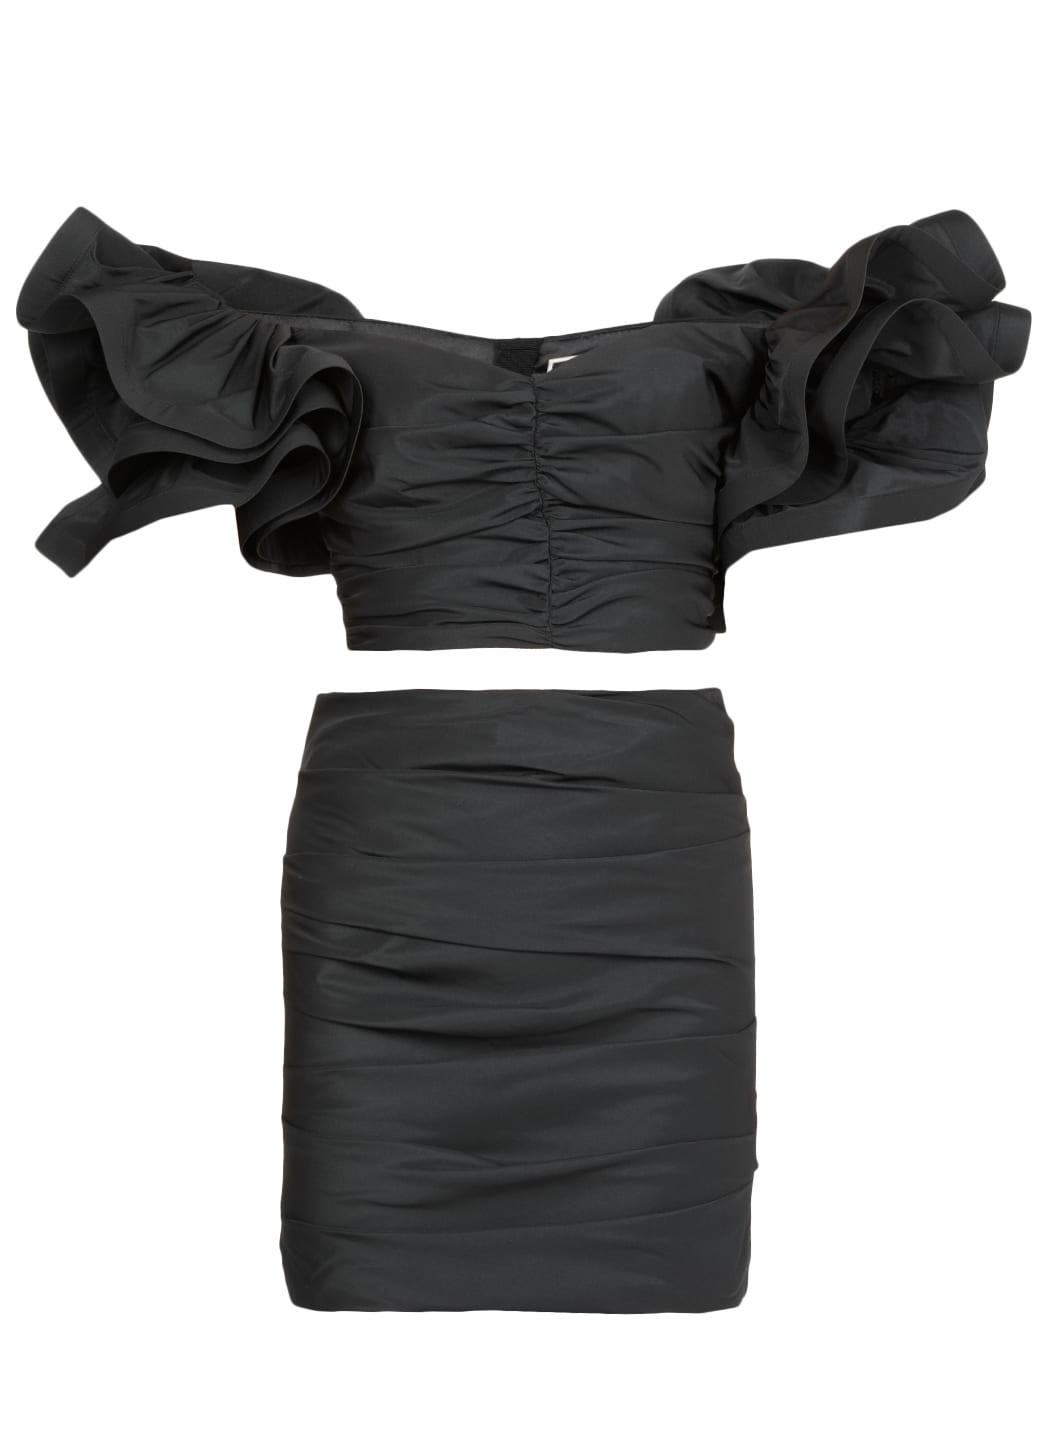 Elisabetta Franchi Draped Dress With Rouches